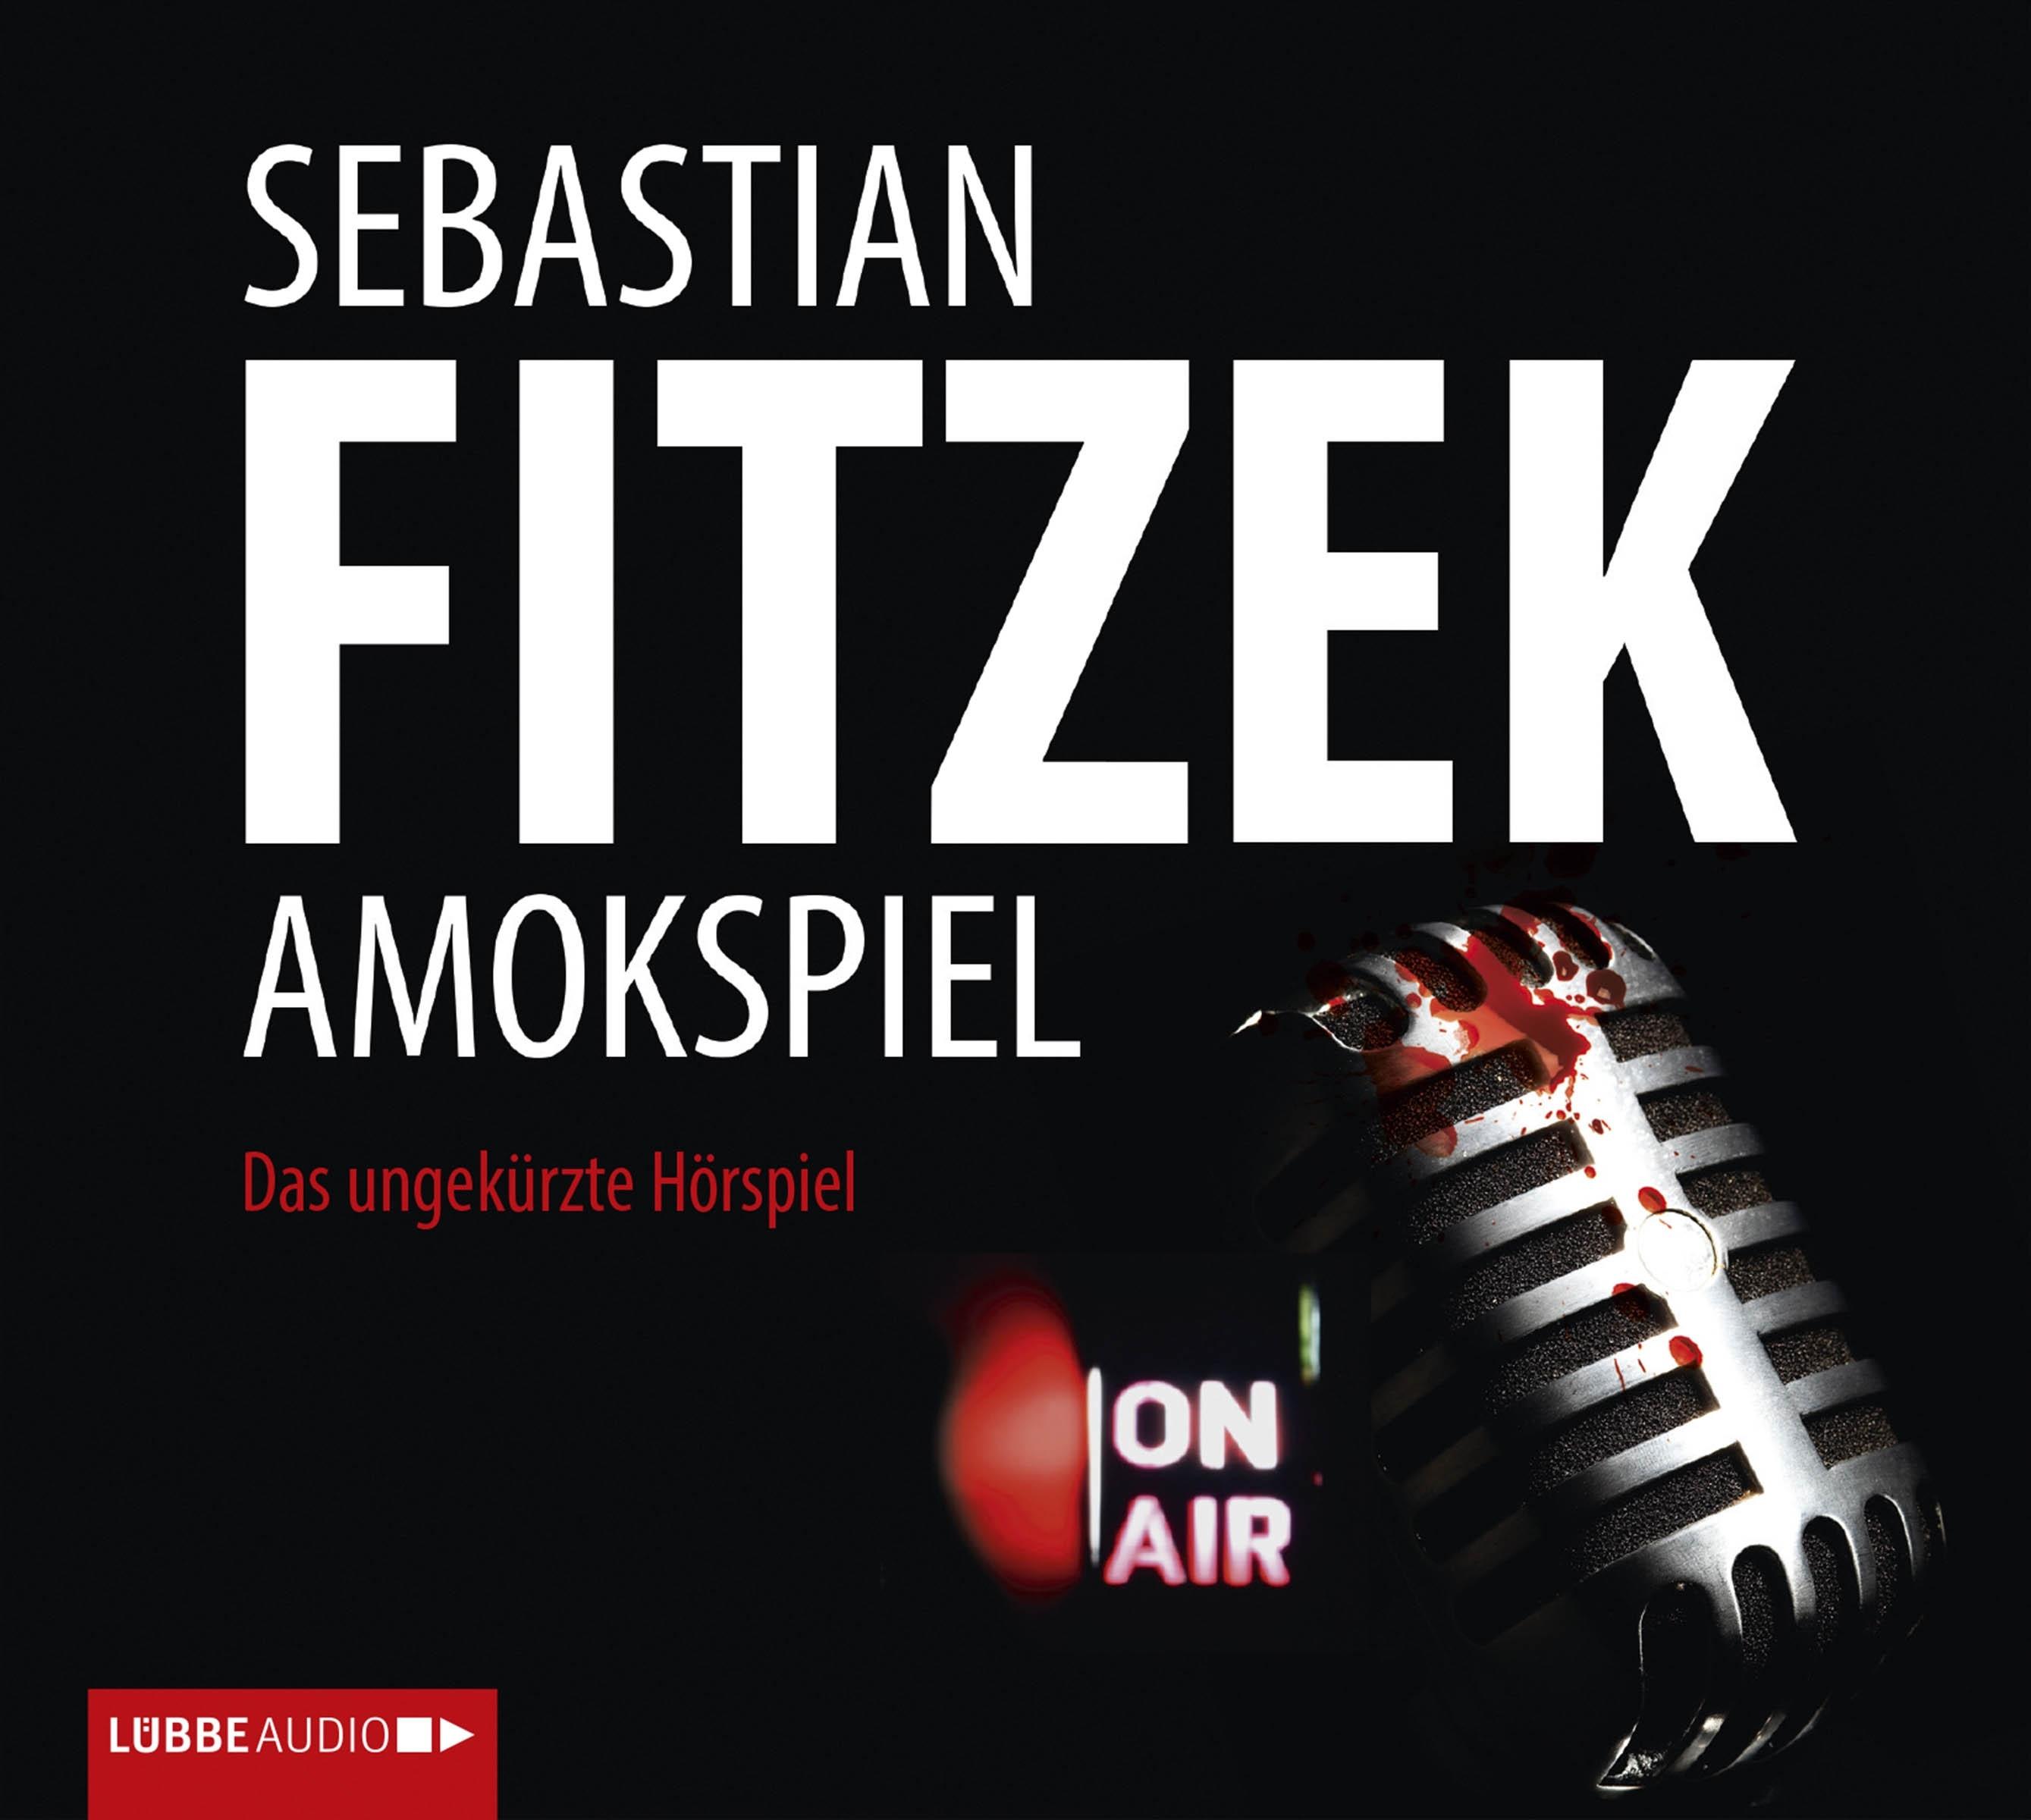 Sebastian Fitzek - Amokspiel - Das ungekürzte Hörspiel